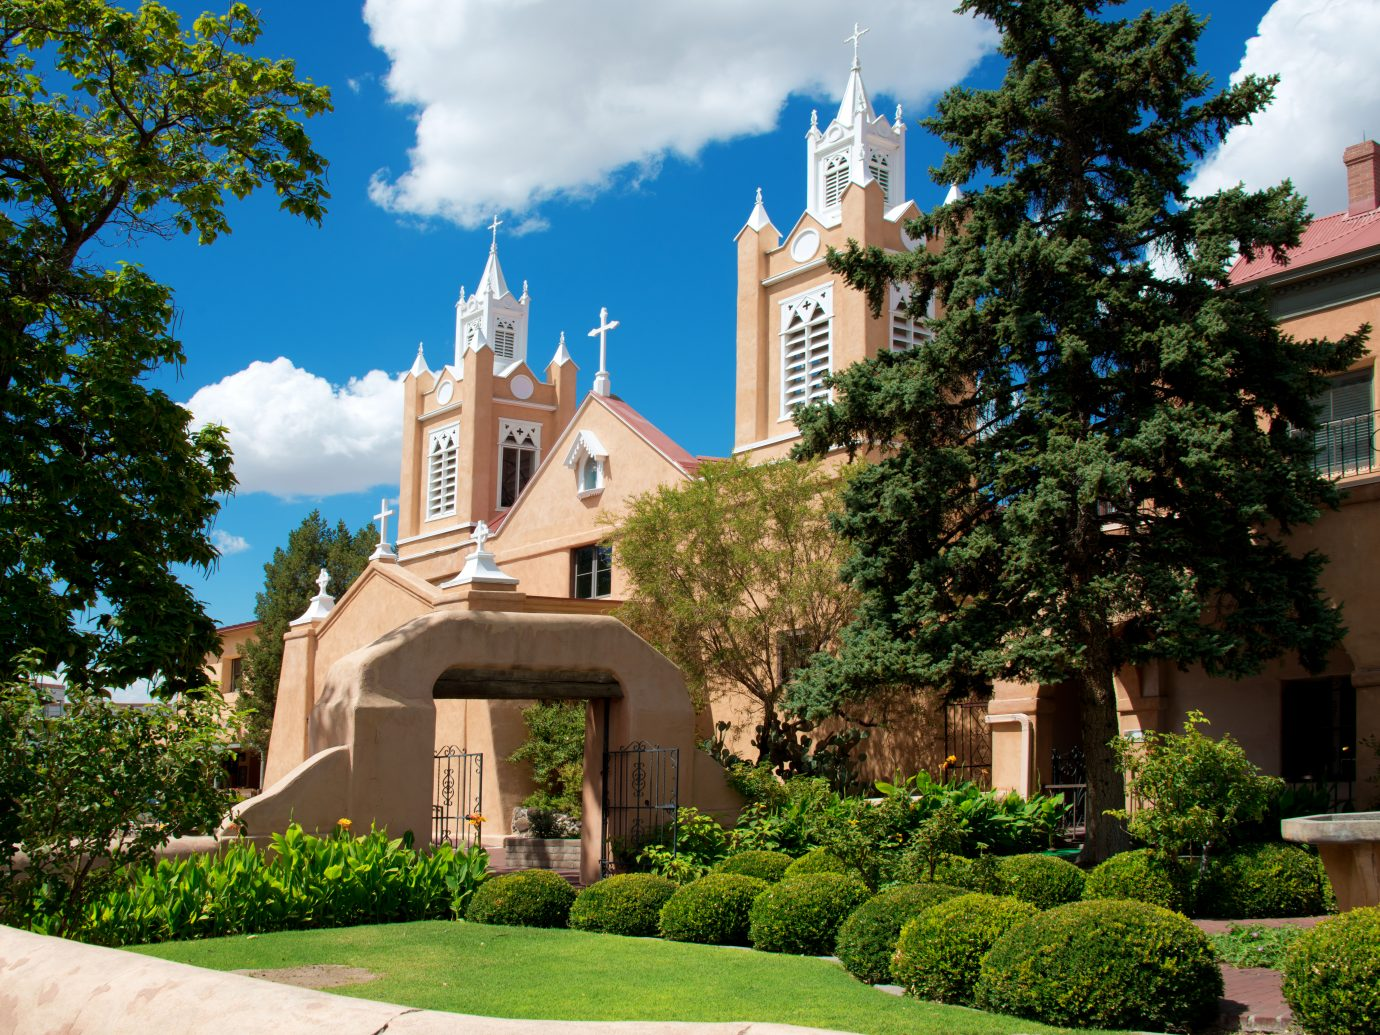 Historic San Felipe de Neri Church, Albuquerque, New Mexico, Old Town Square.